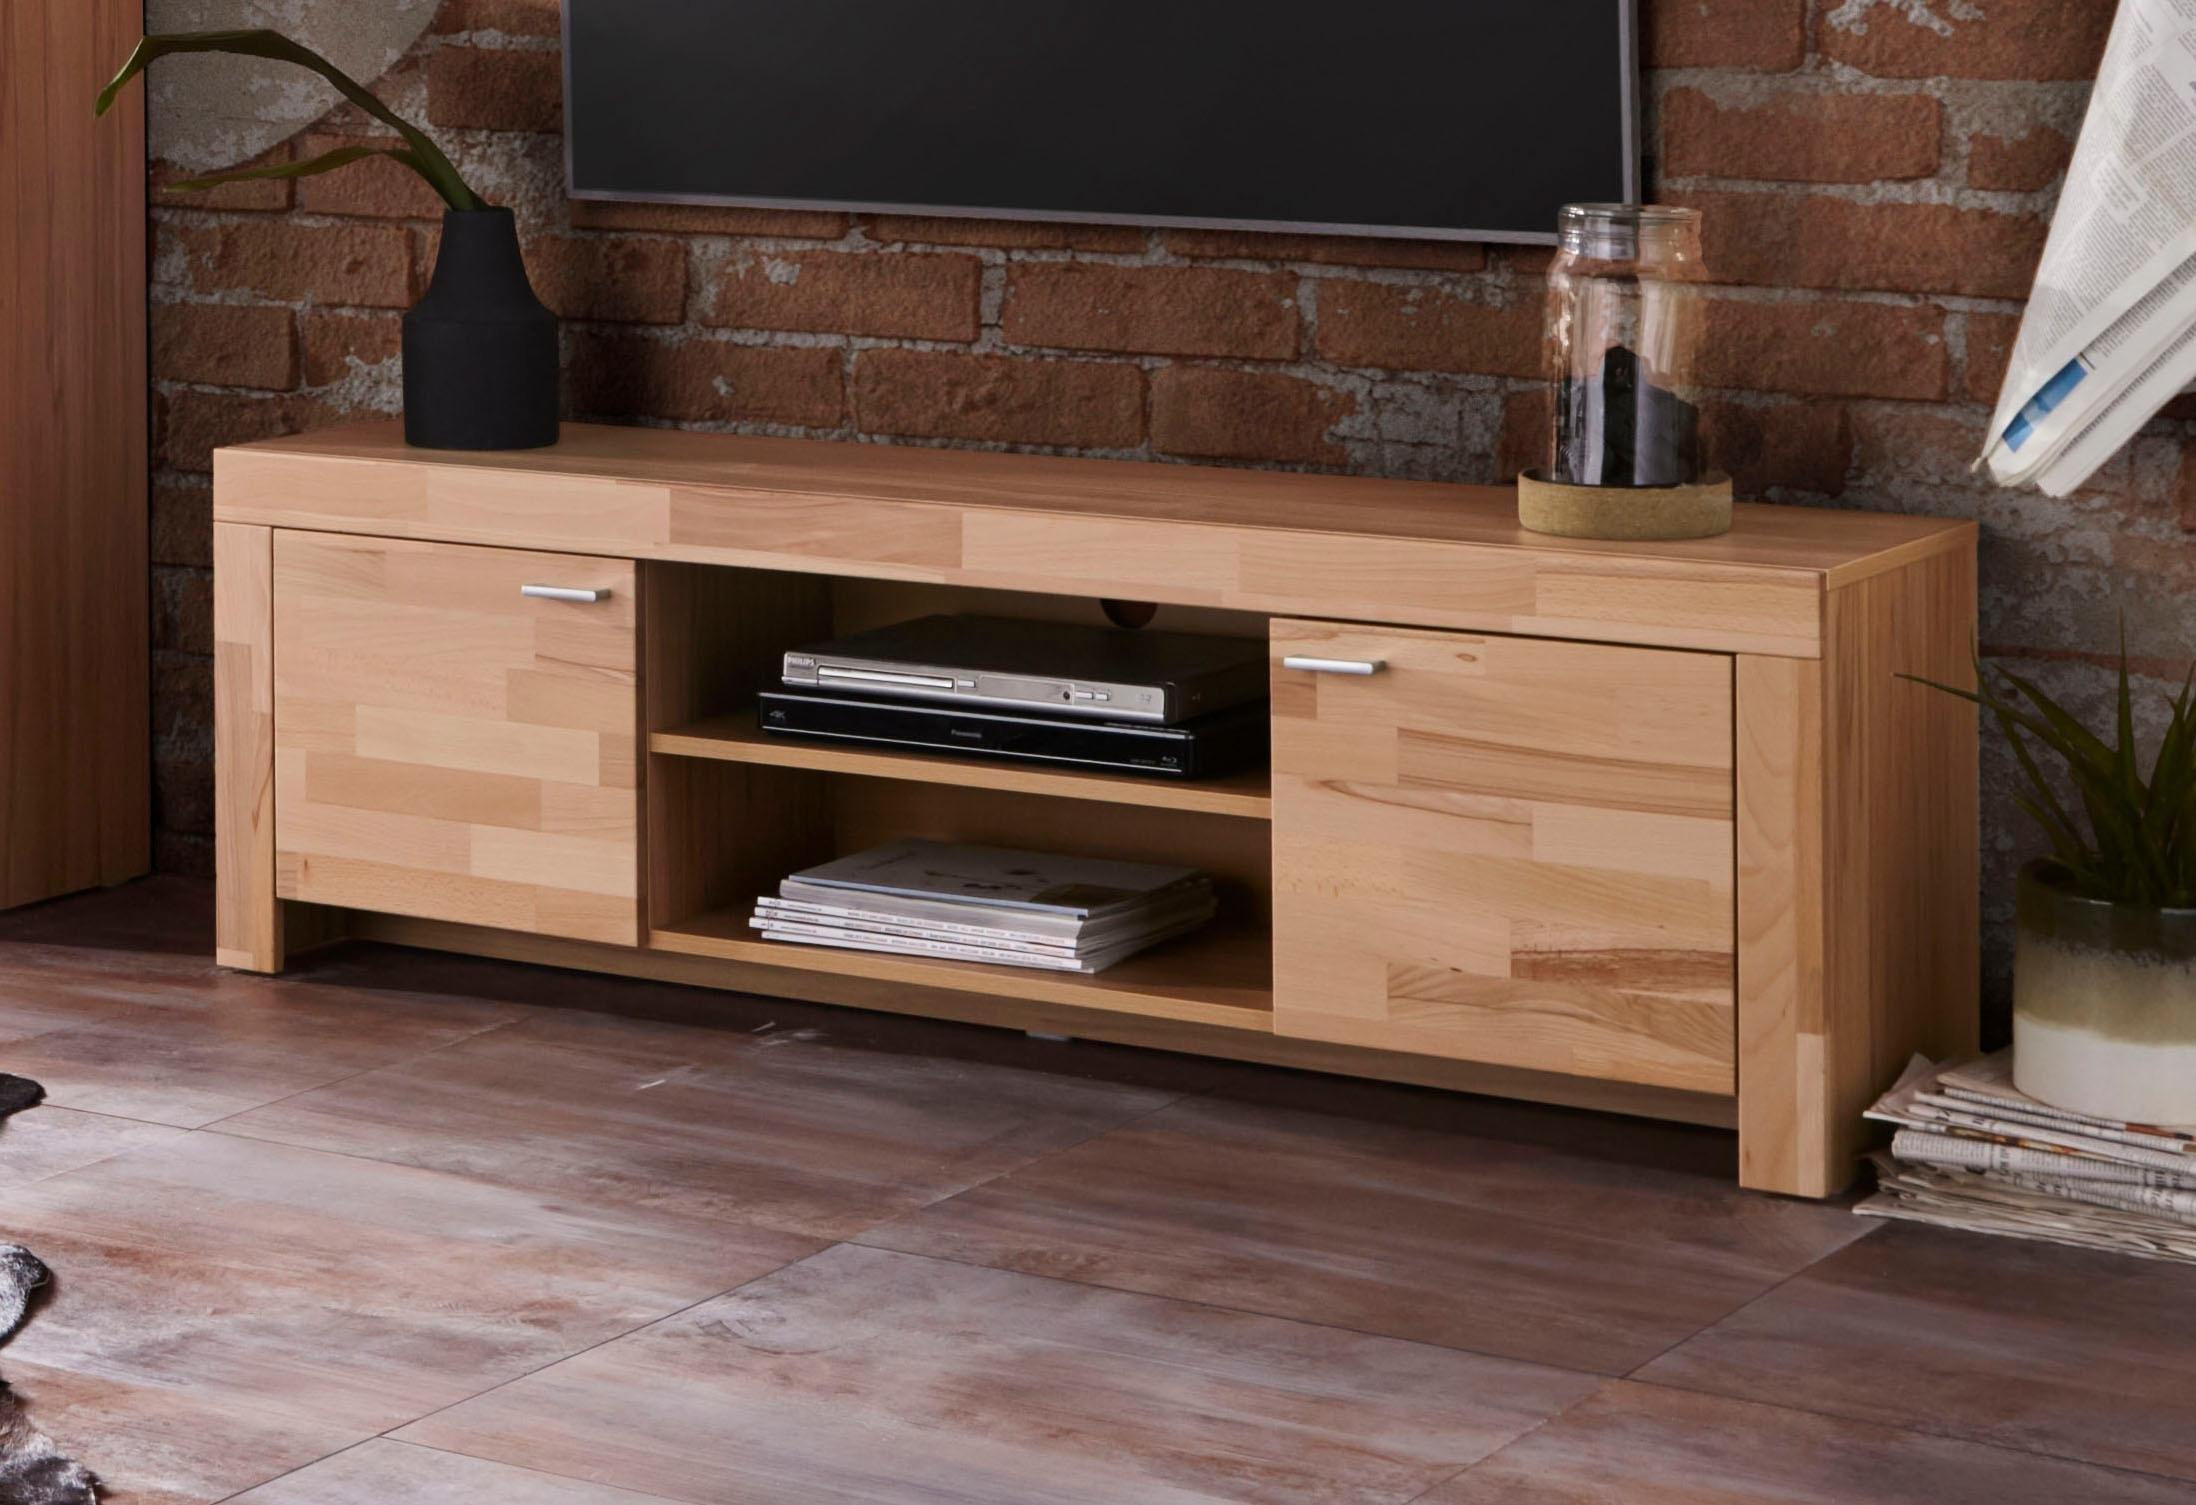 Premium collection by Home affaire tv-meubel Sintra Breedte 148,5 cm veilig op otto.nl kopen